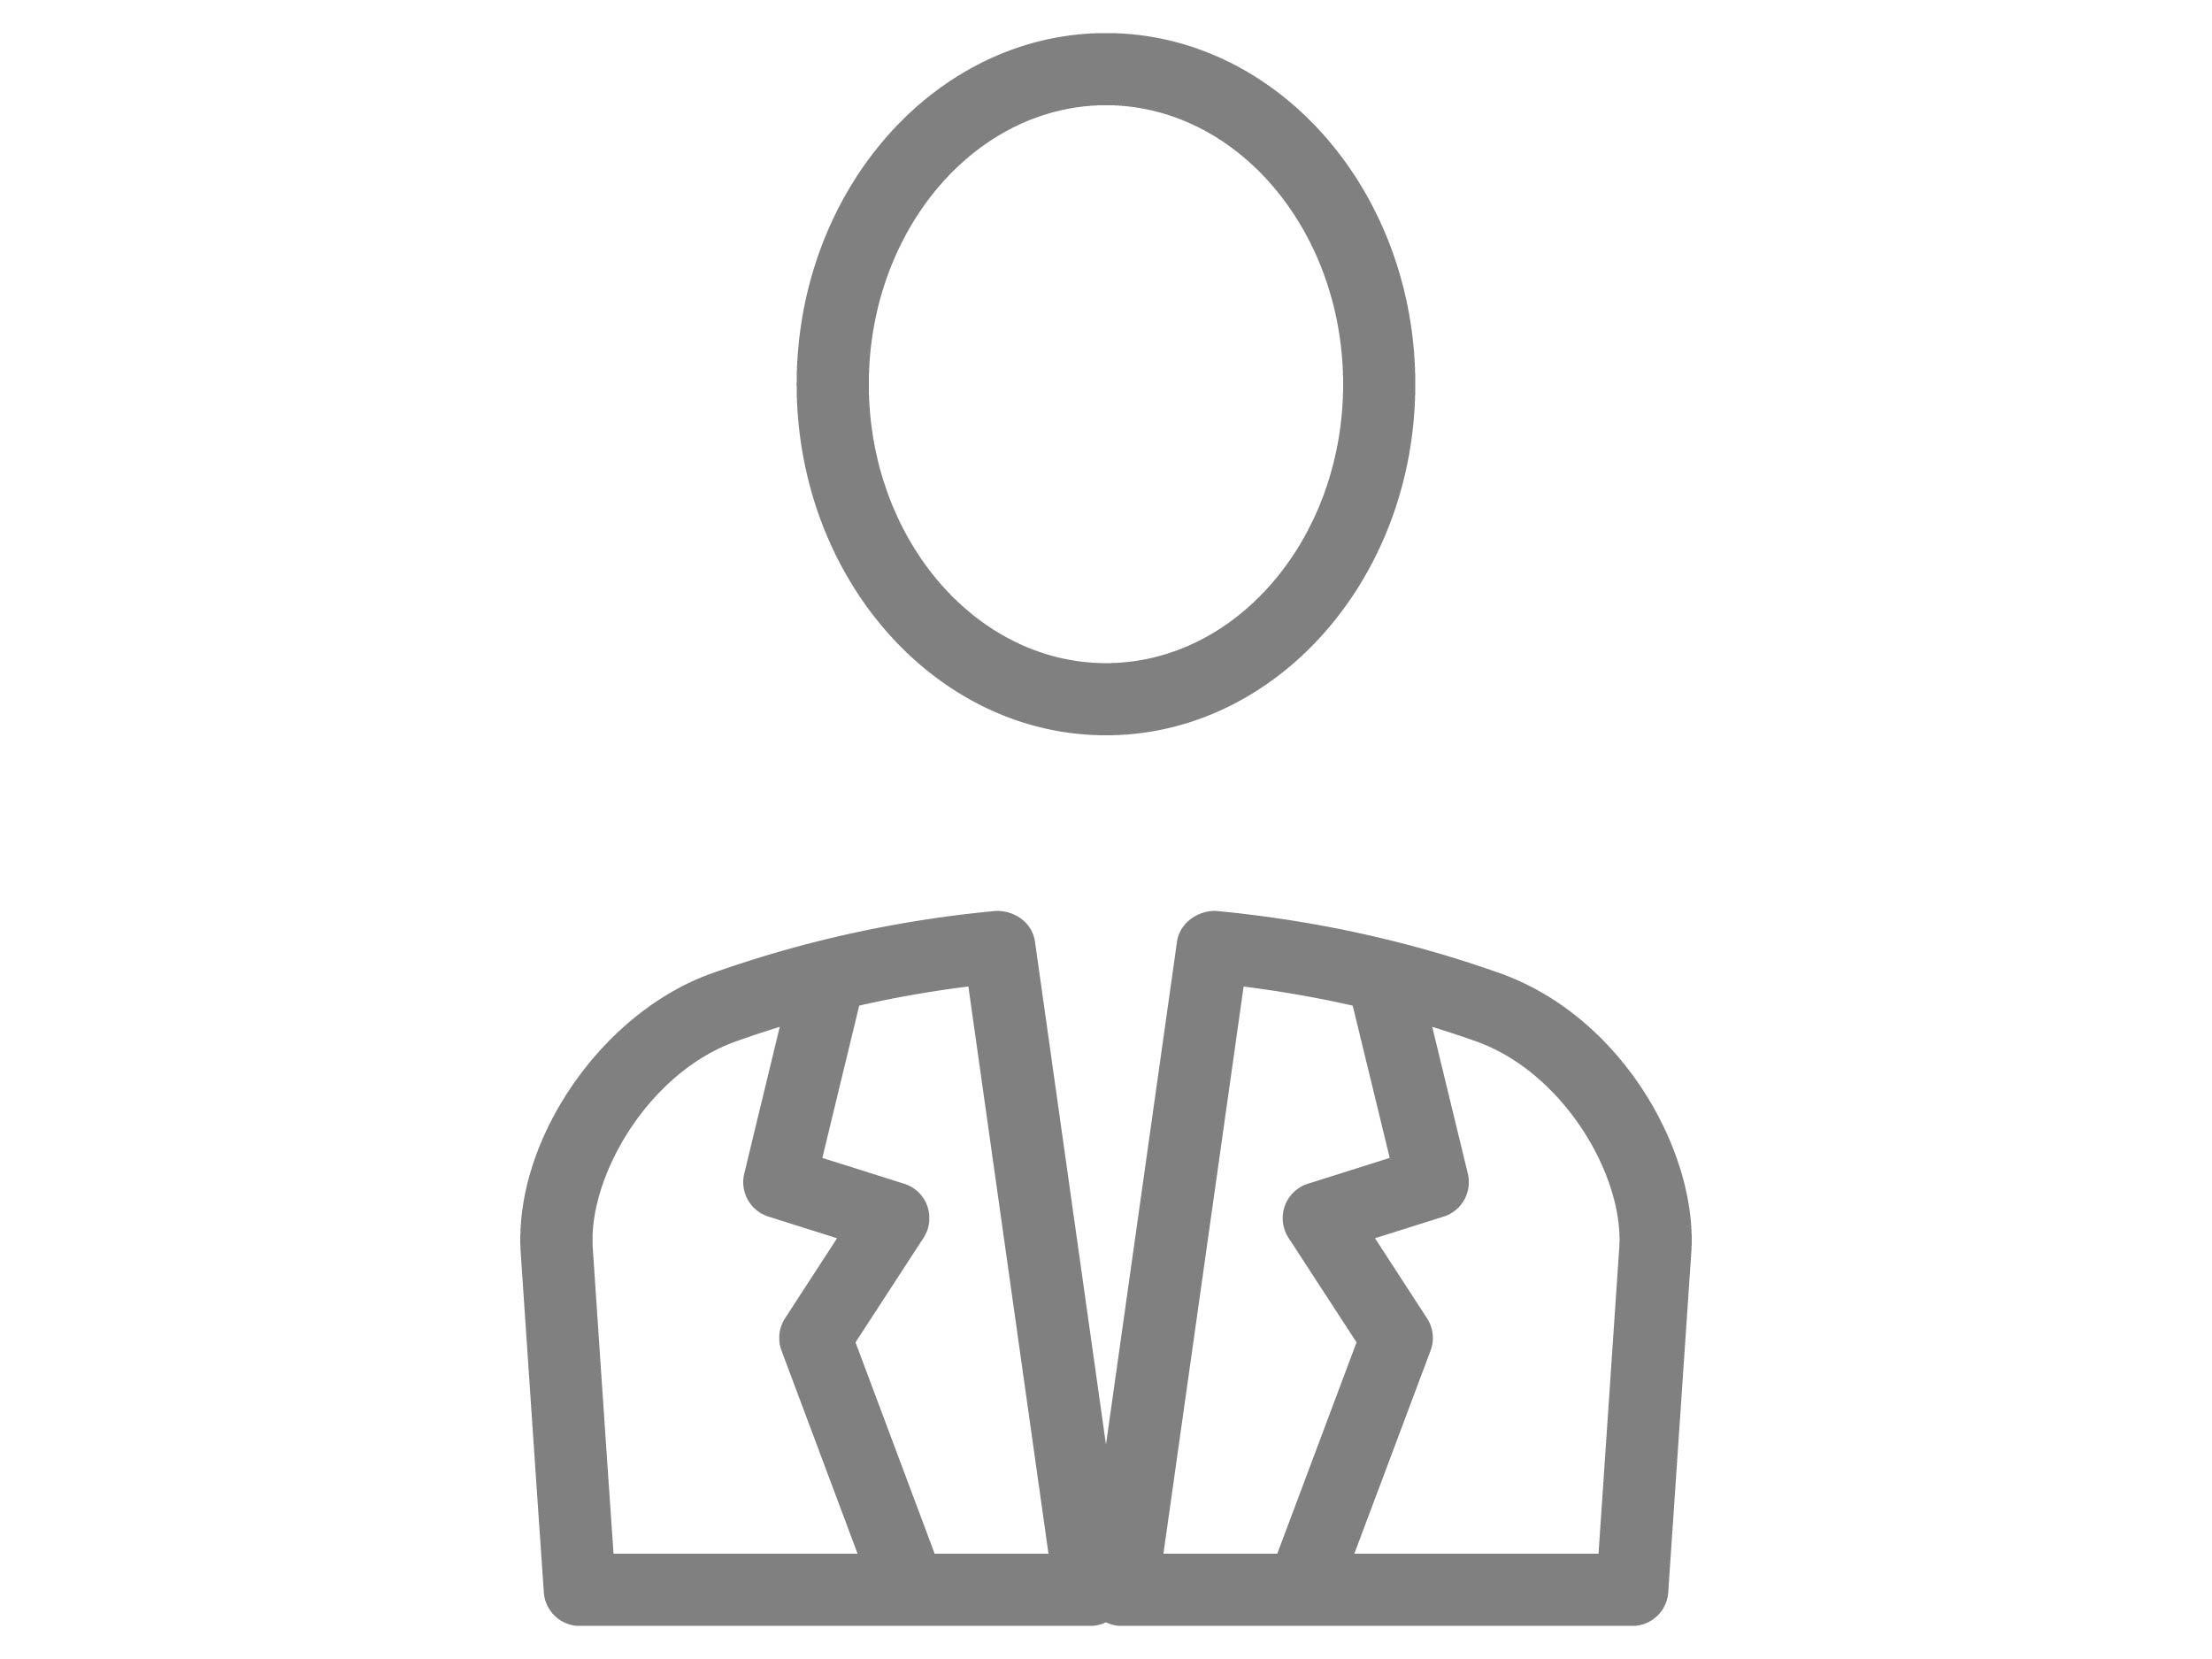 single_login_icon.jpg